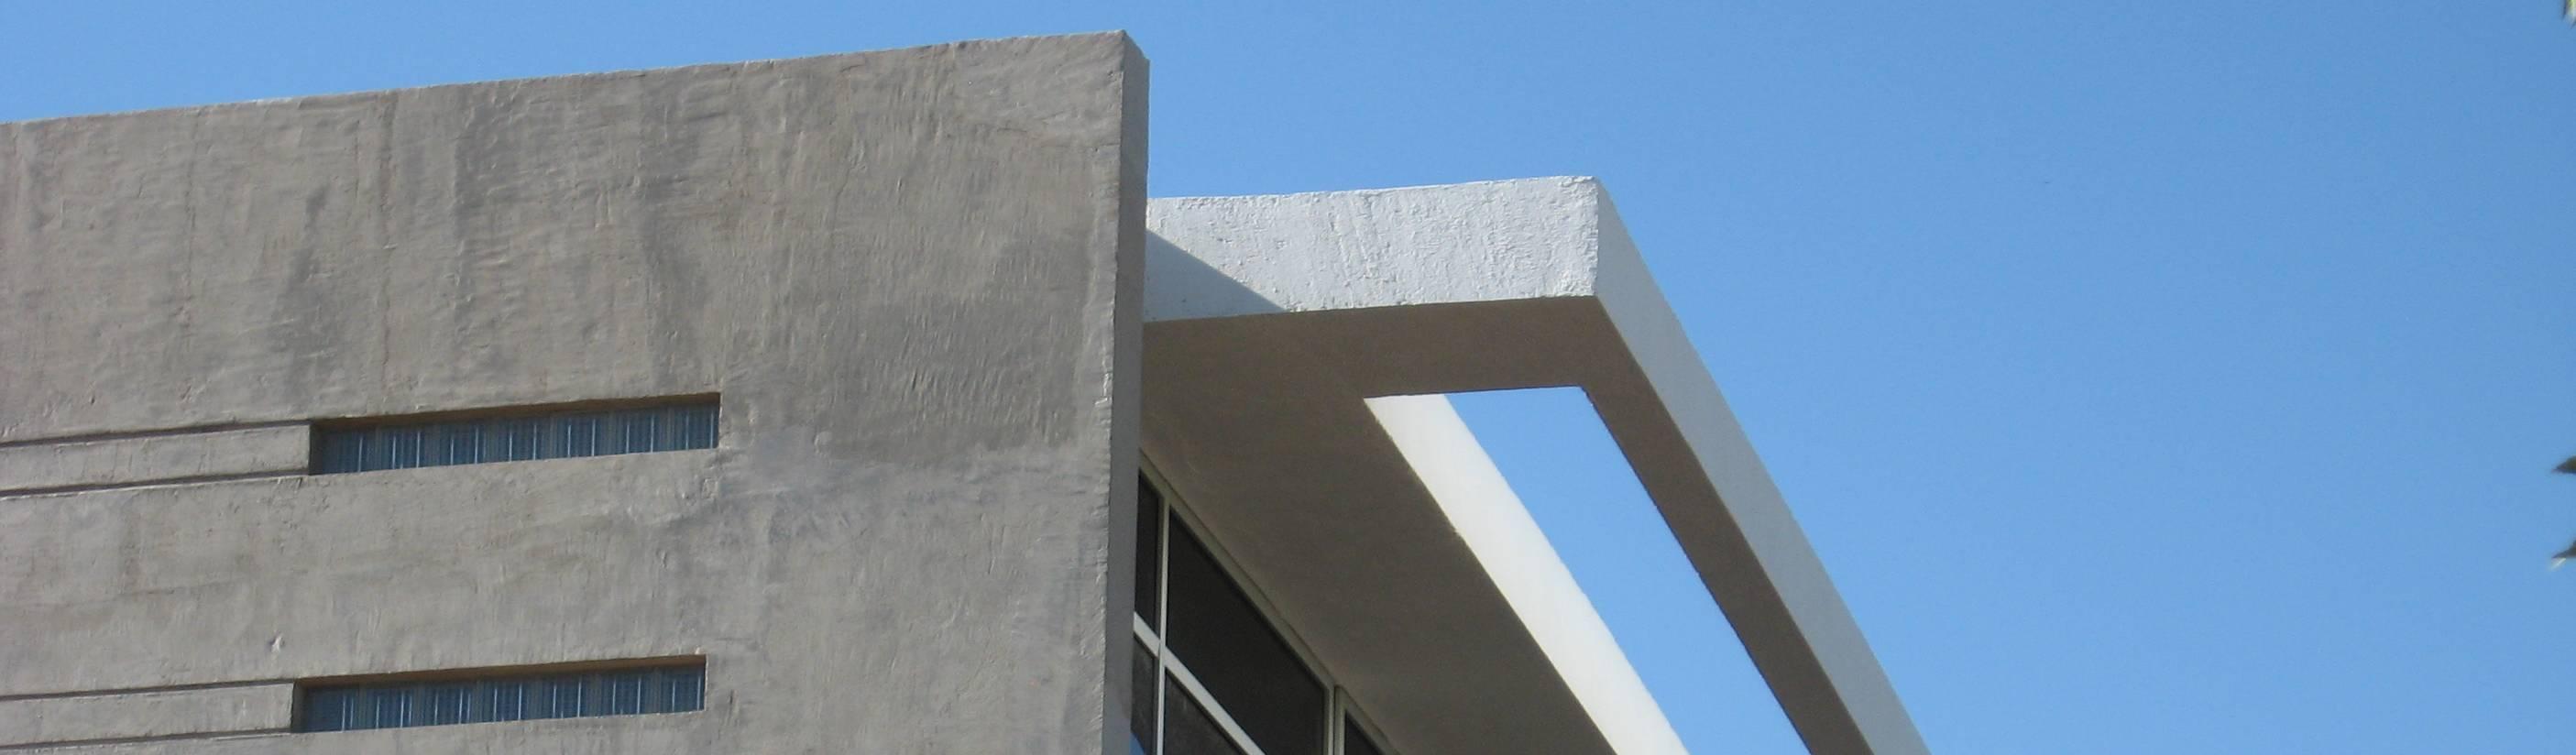 YANCARELLI – GOMEZ CODINA arquitectos